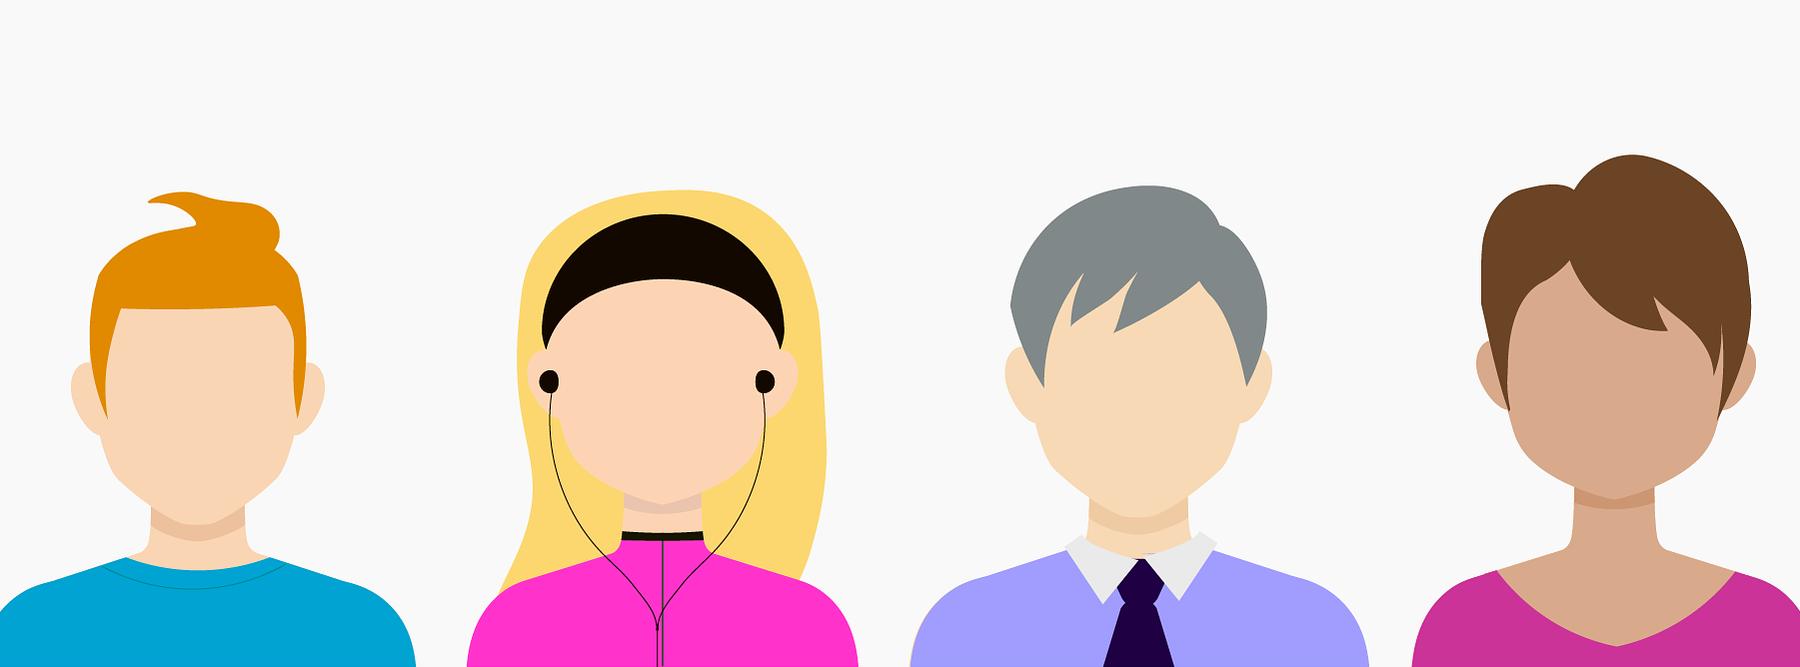 5 consejos para generar engagement entre tus clientes